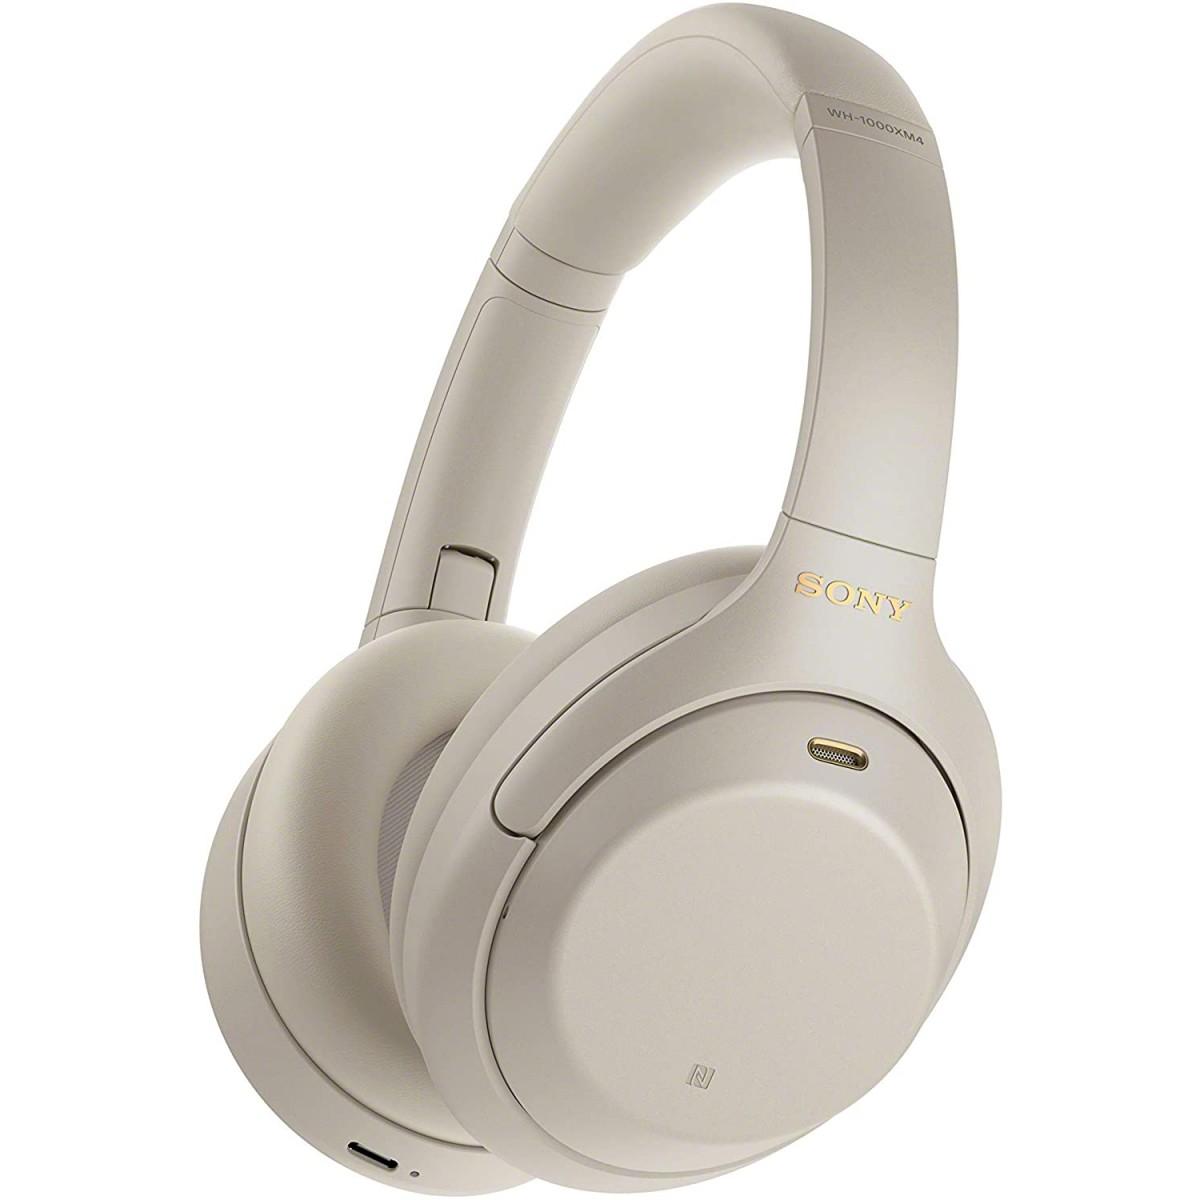 Sony WH-1000XM4 auriculares inalambricos probable MÍNIMO HISTÓRICO